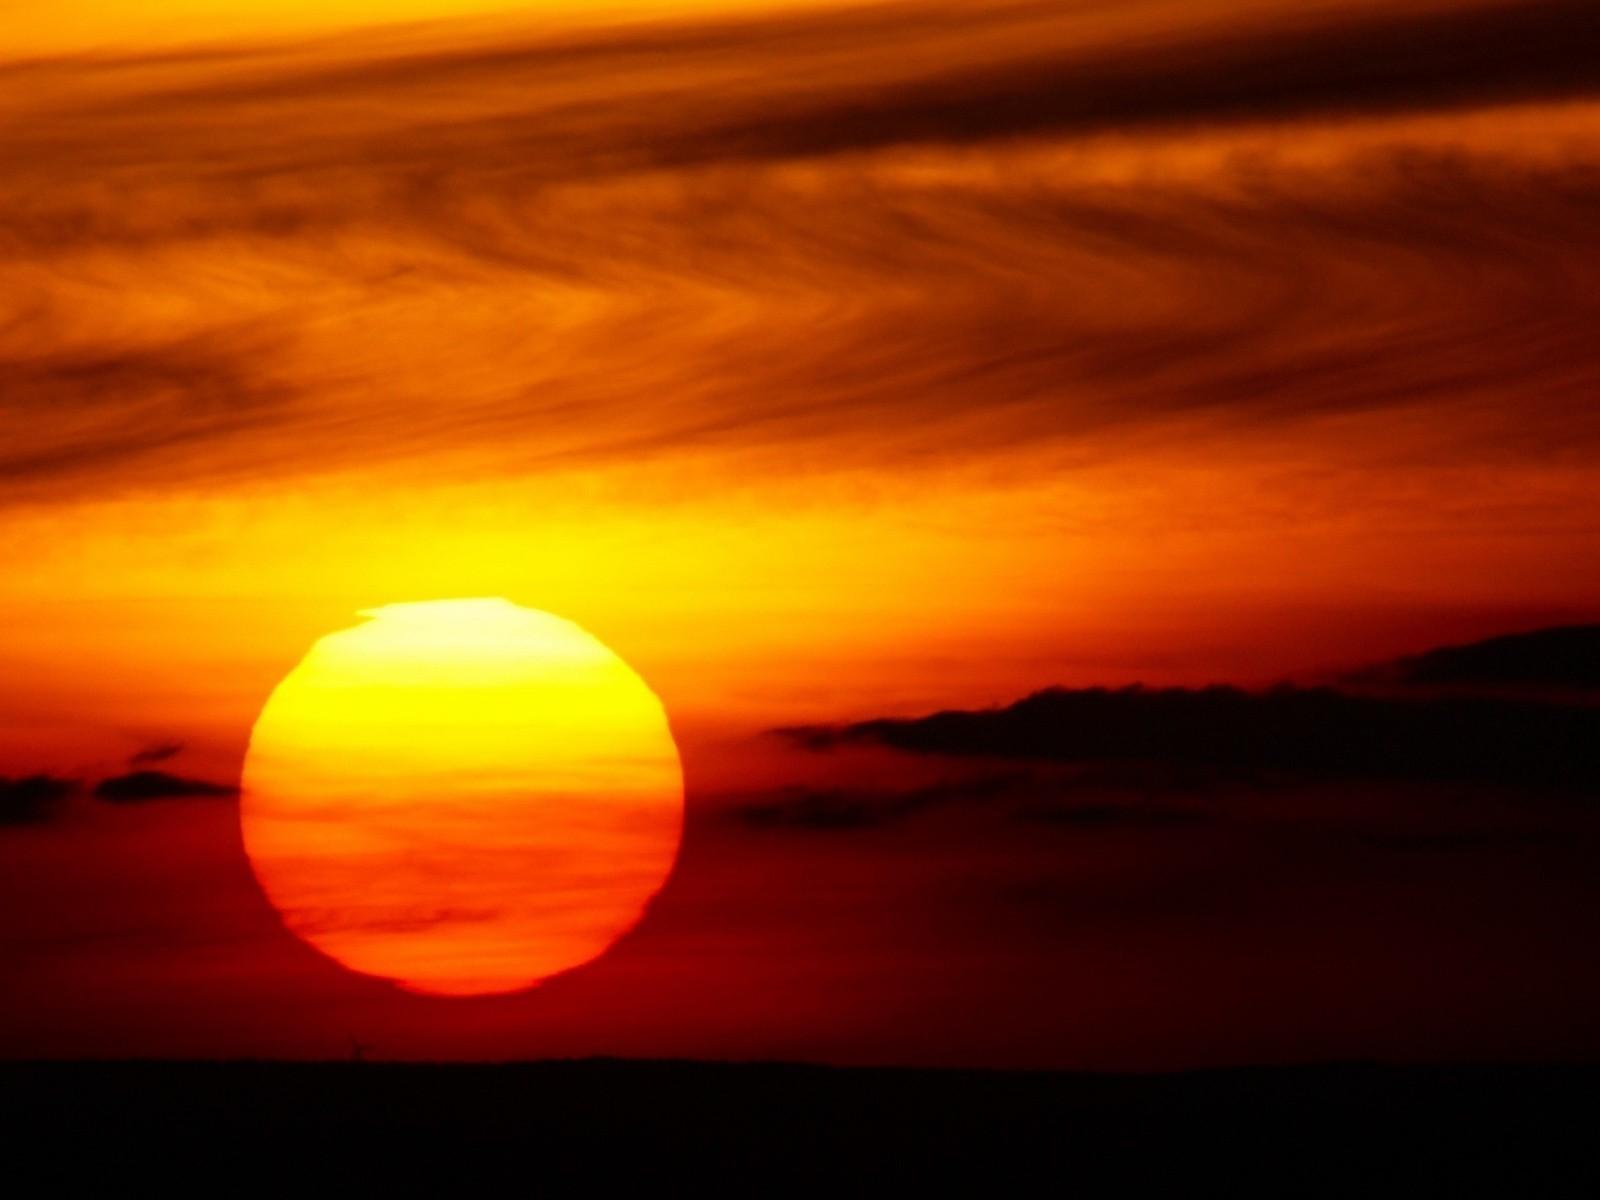 Hintergrundbilder : Sonnenlicht, Sonnenuntergang, rot, Betrachtung, Sonnenaufgang, Abend, Morgen ...